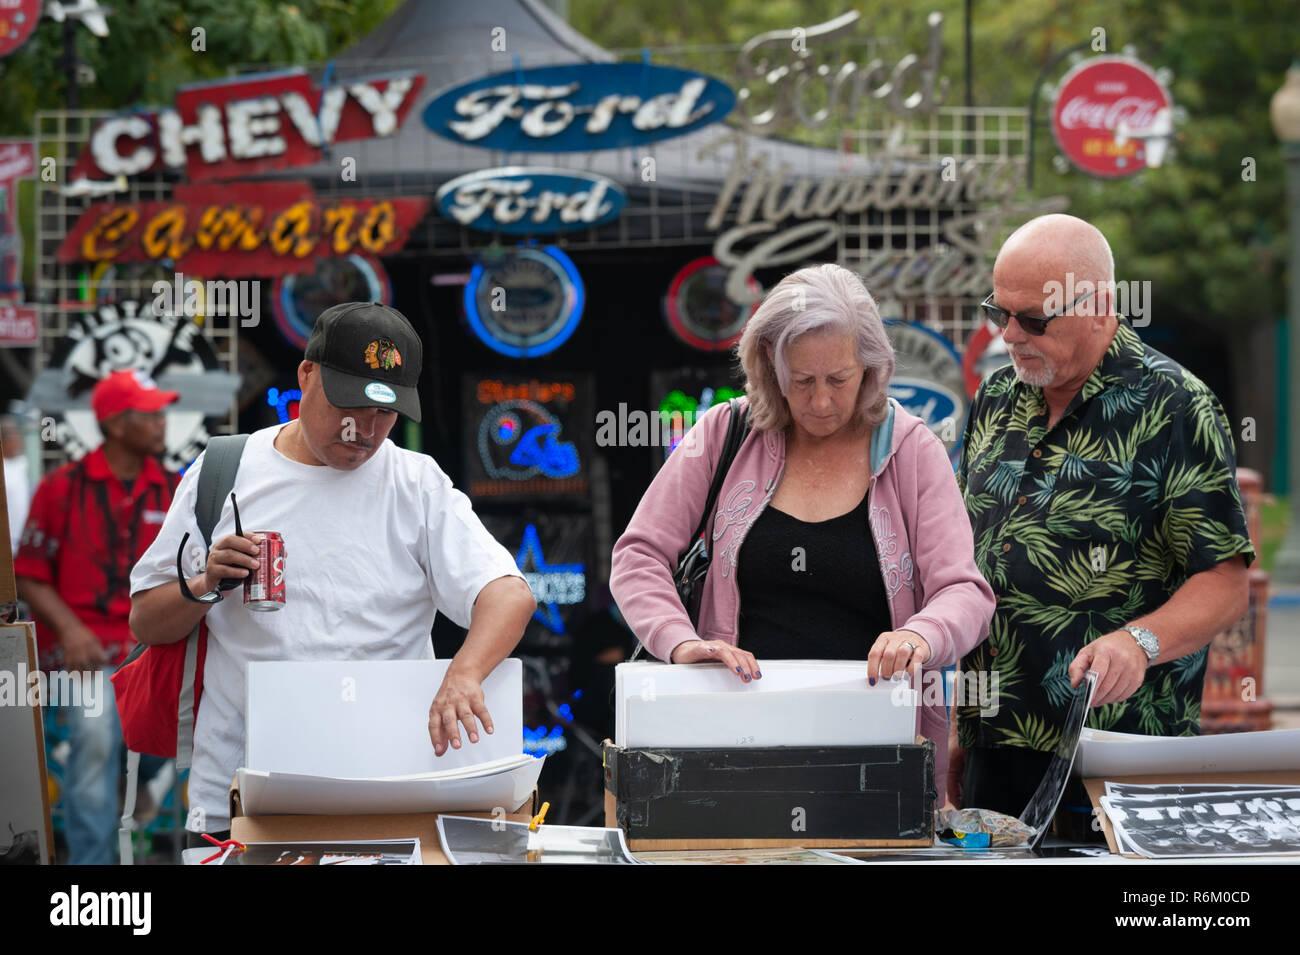 SAN BERNARDINO, Calif (Oct 6, 2018)  Joe Cruz, left, of Fontana, Calf., and Linda and Malcolm Juckes, visiting from Brighton, England, peruse reprodut - Stock Image